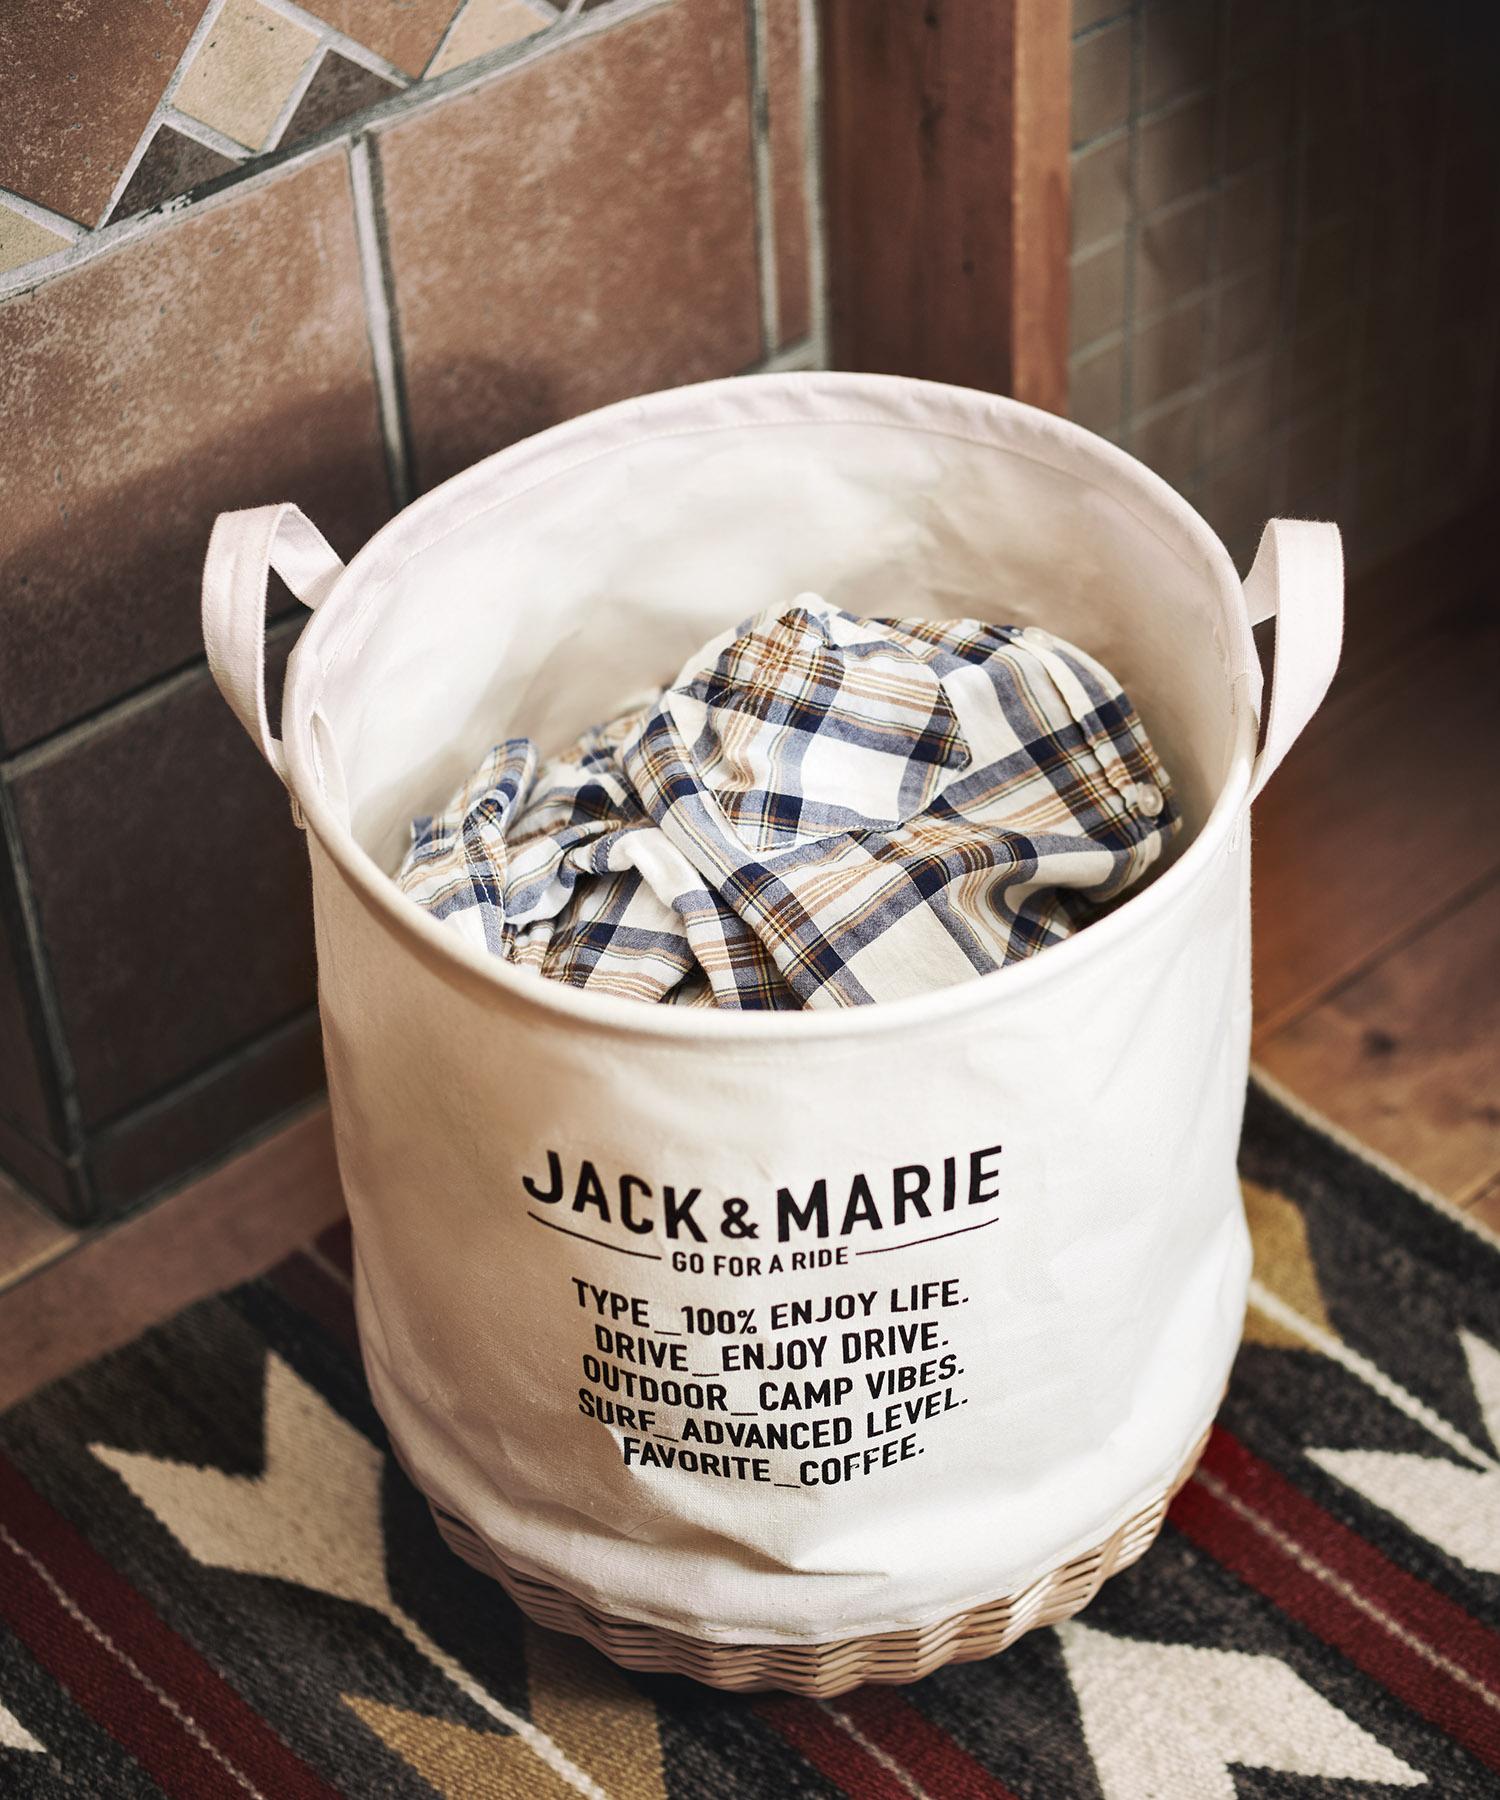 「JACK&MARIE」ウィローバスケット